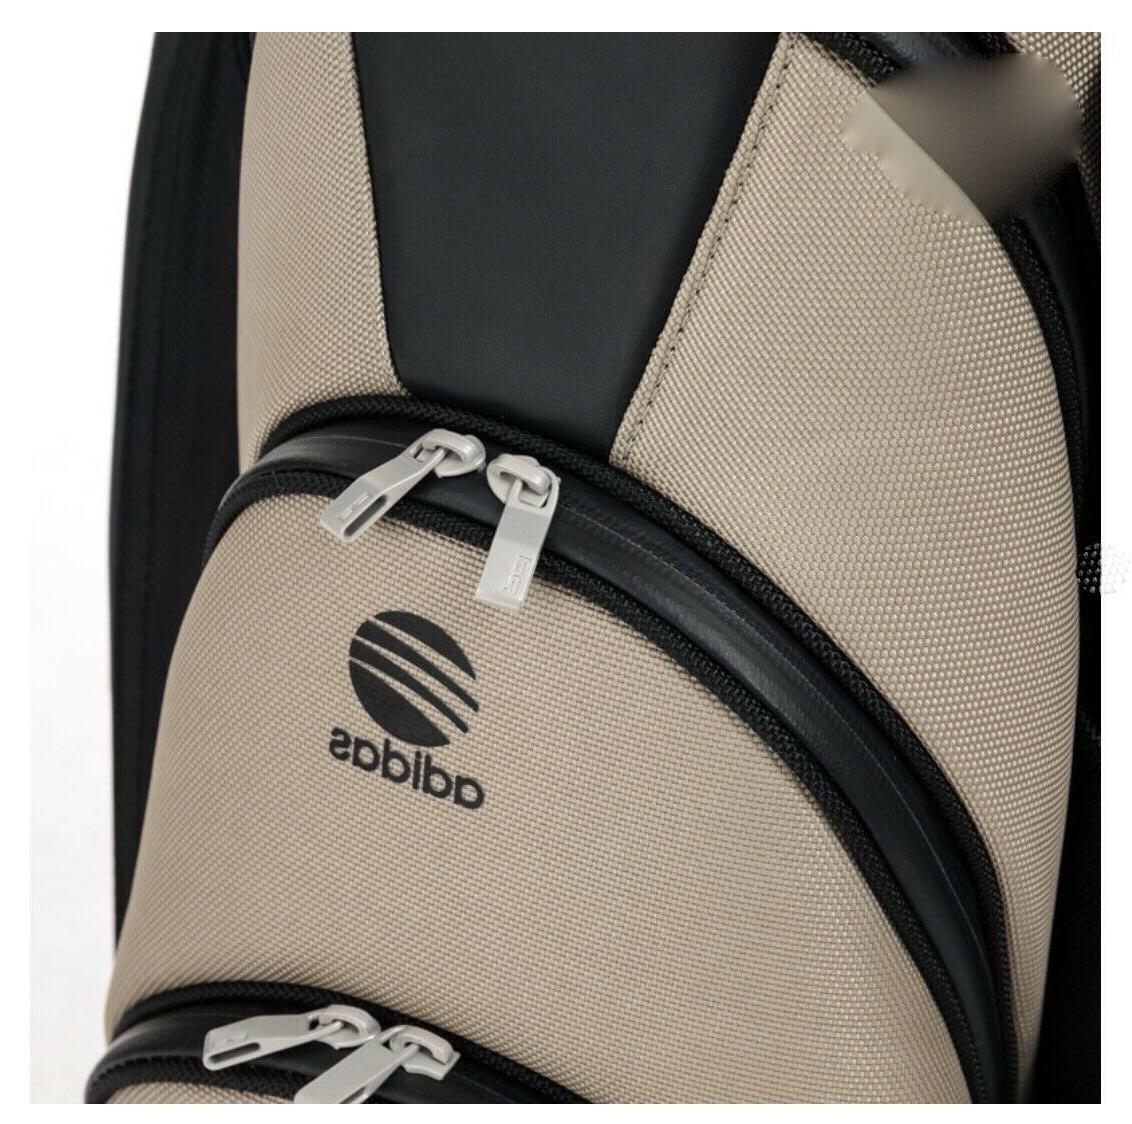 PORSCHE DESIGN ADIDAS GOLF CART BAG BLACK/SAND